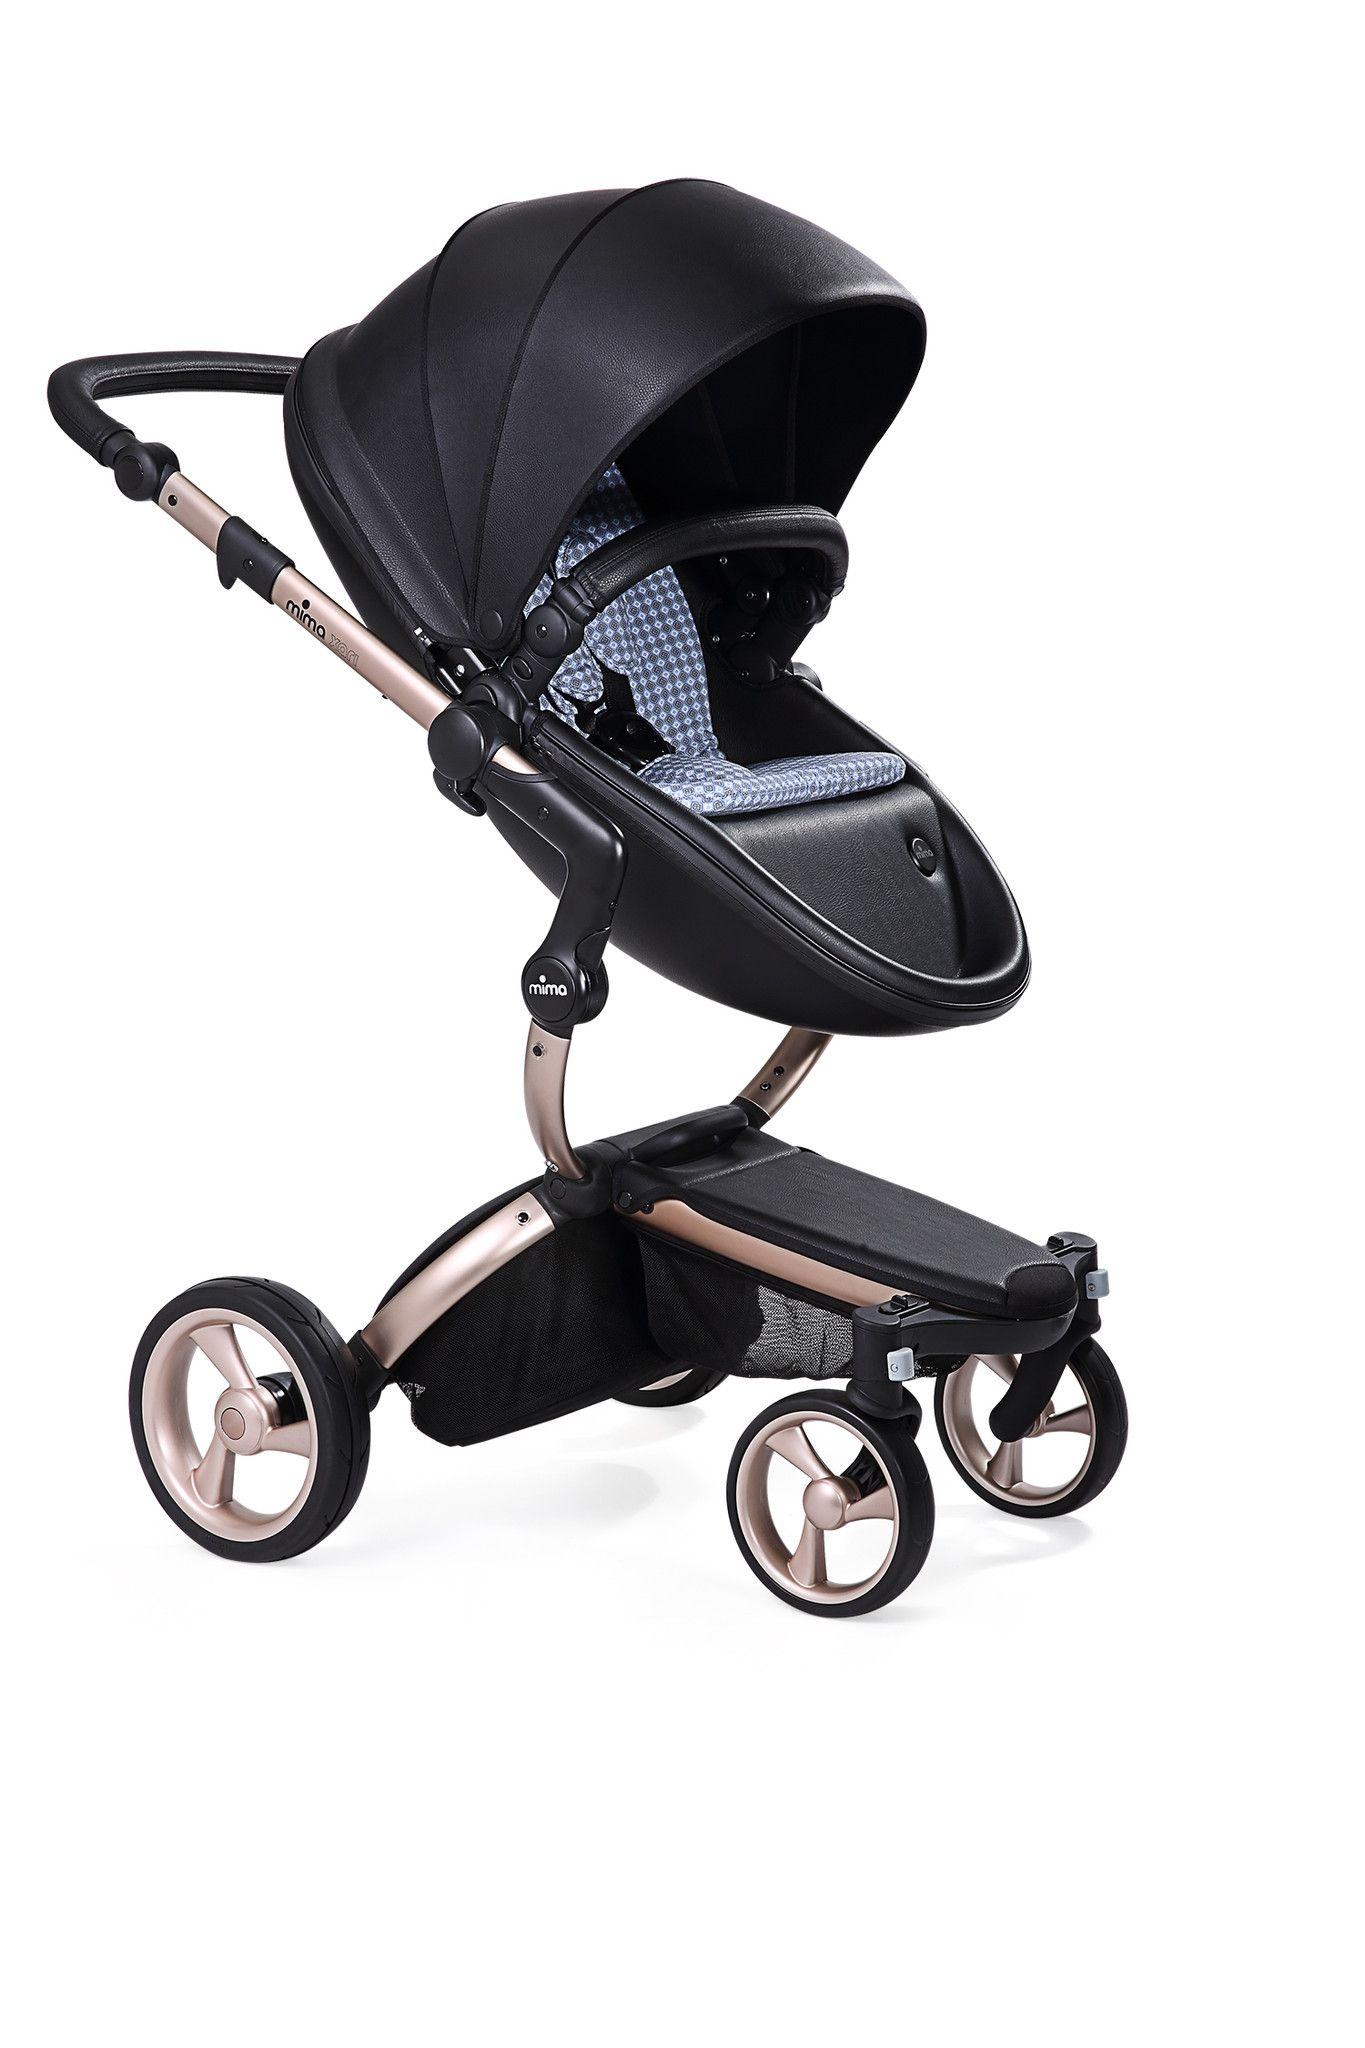 Mima Xari Black Seat, Retro Blue Starter Pack The only